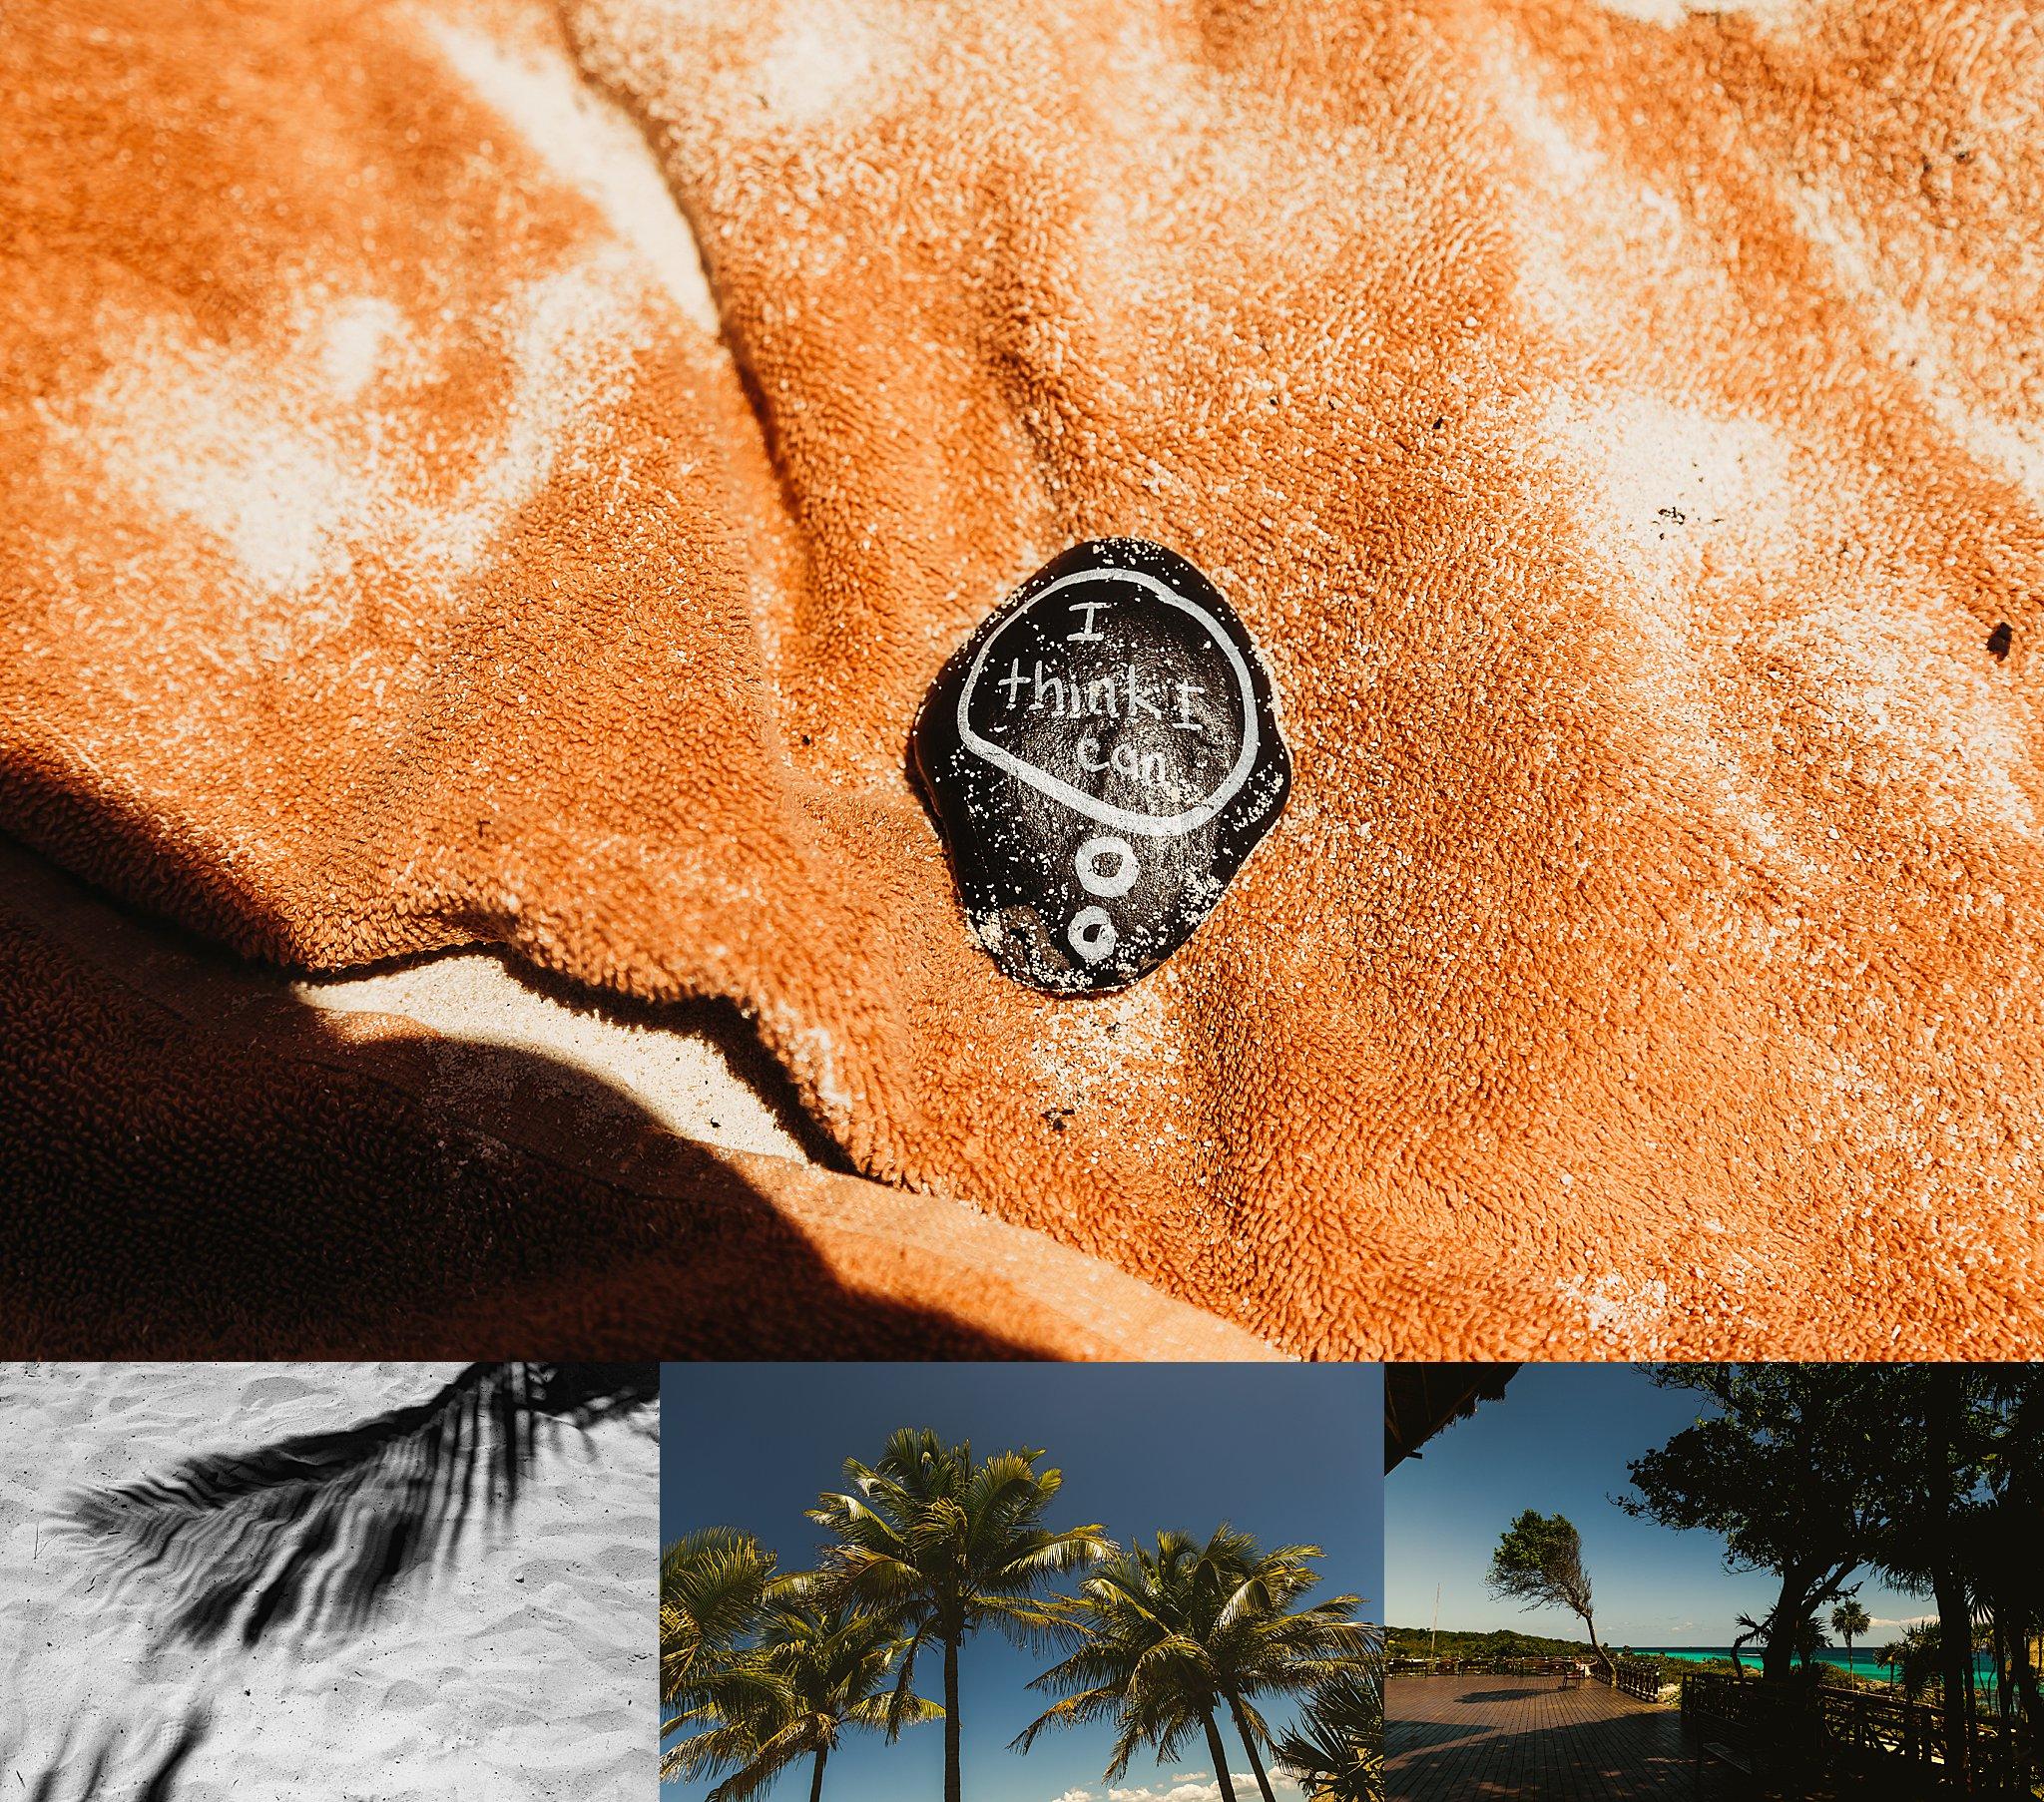 Mexico Vacation 2019 Anna Hurley Photography 15.jpg